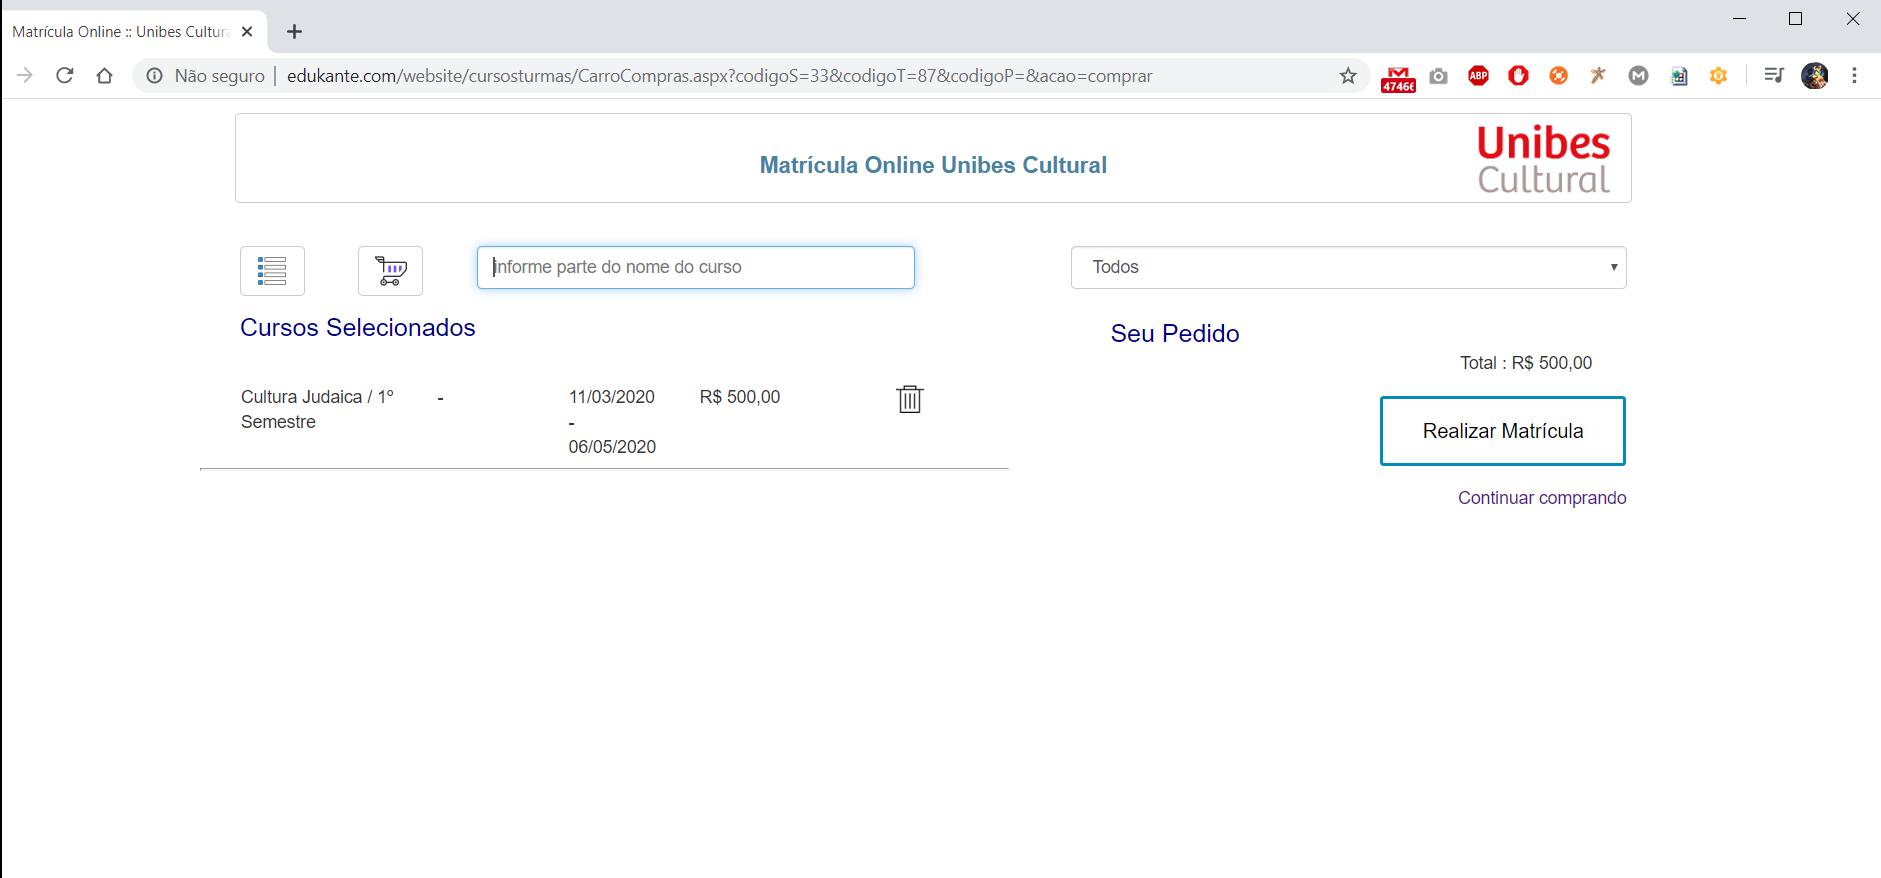 Carro de Compras de Cursos, Software Matrículas Online edukante